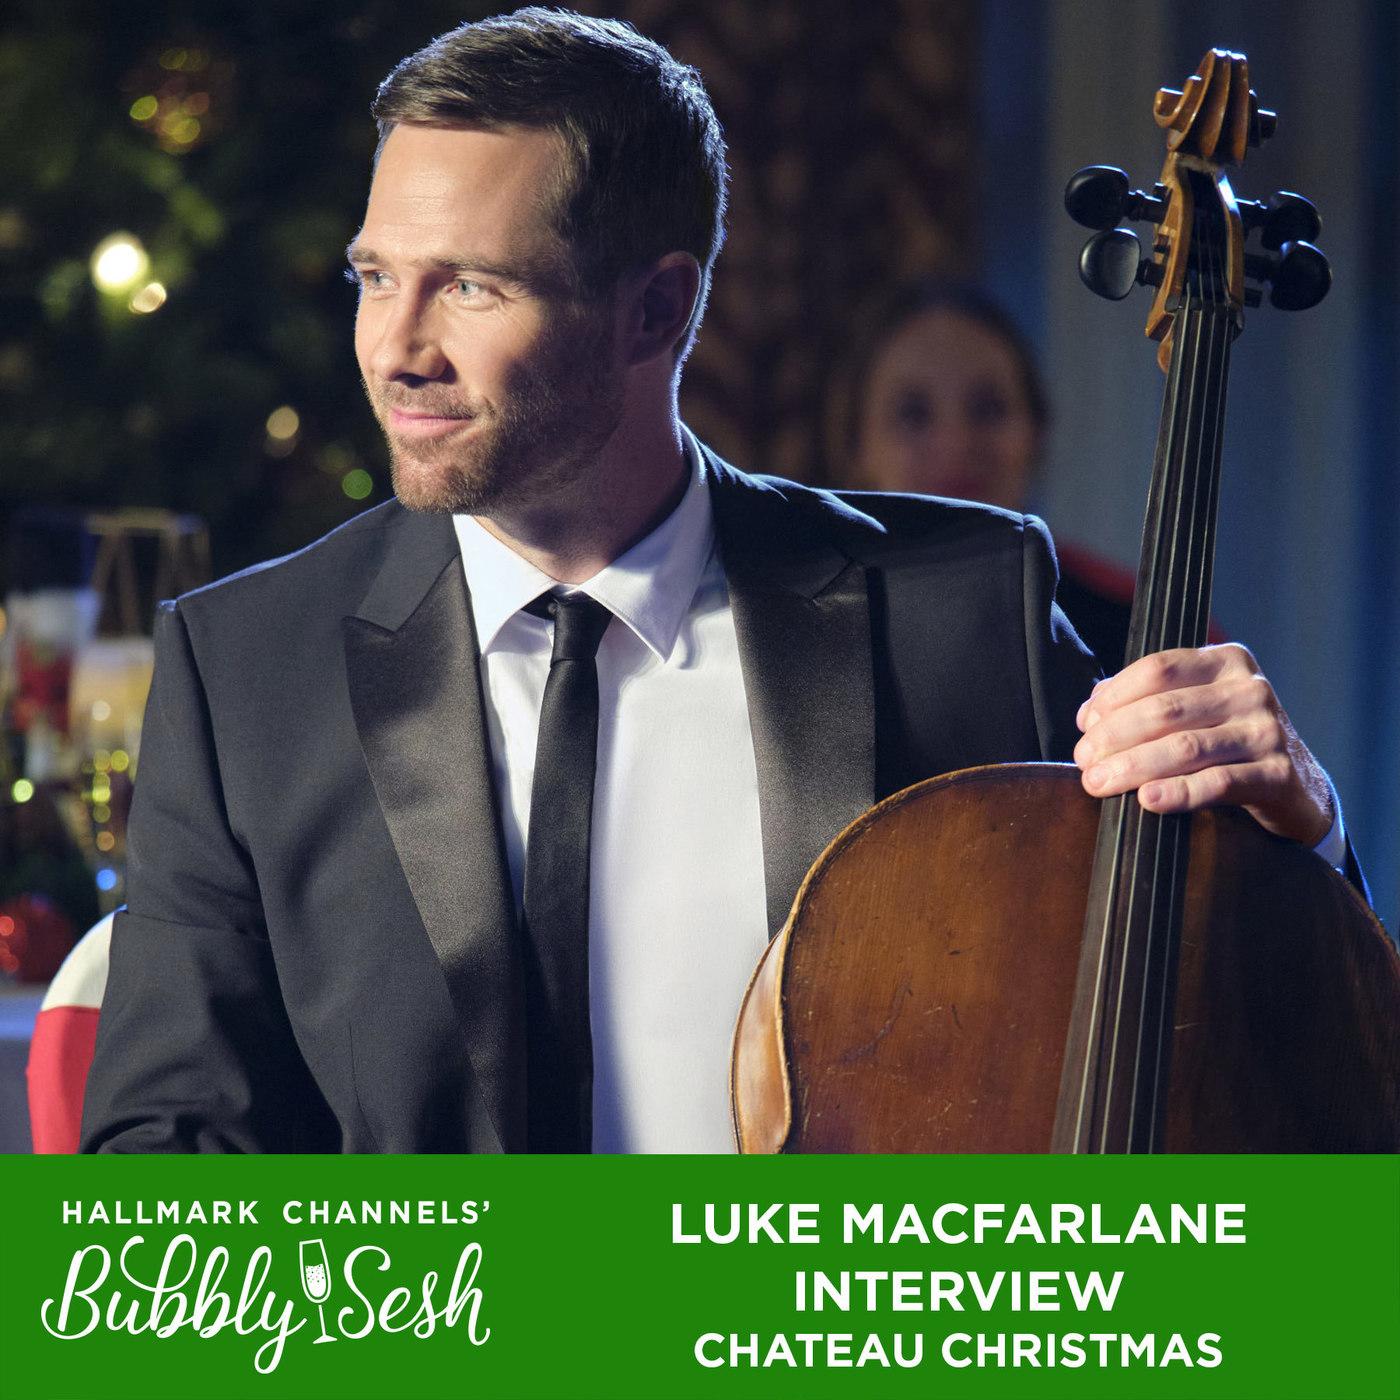 Luke MacFarlane Interview, Chateau Christmas